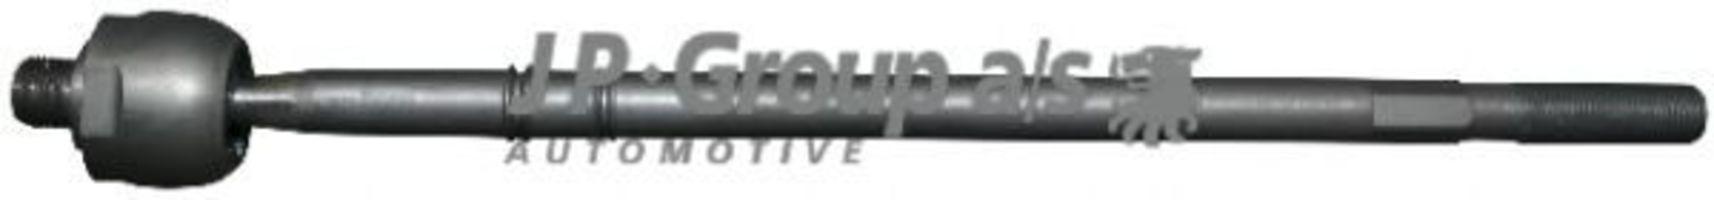 Наконечник рулевой тяги JP GROUP 1144403600